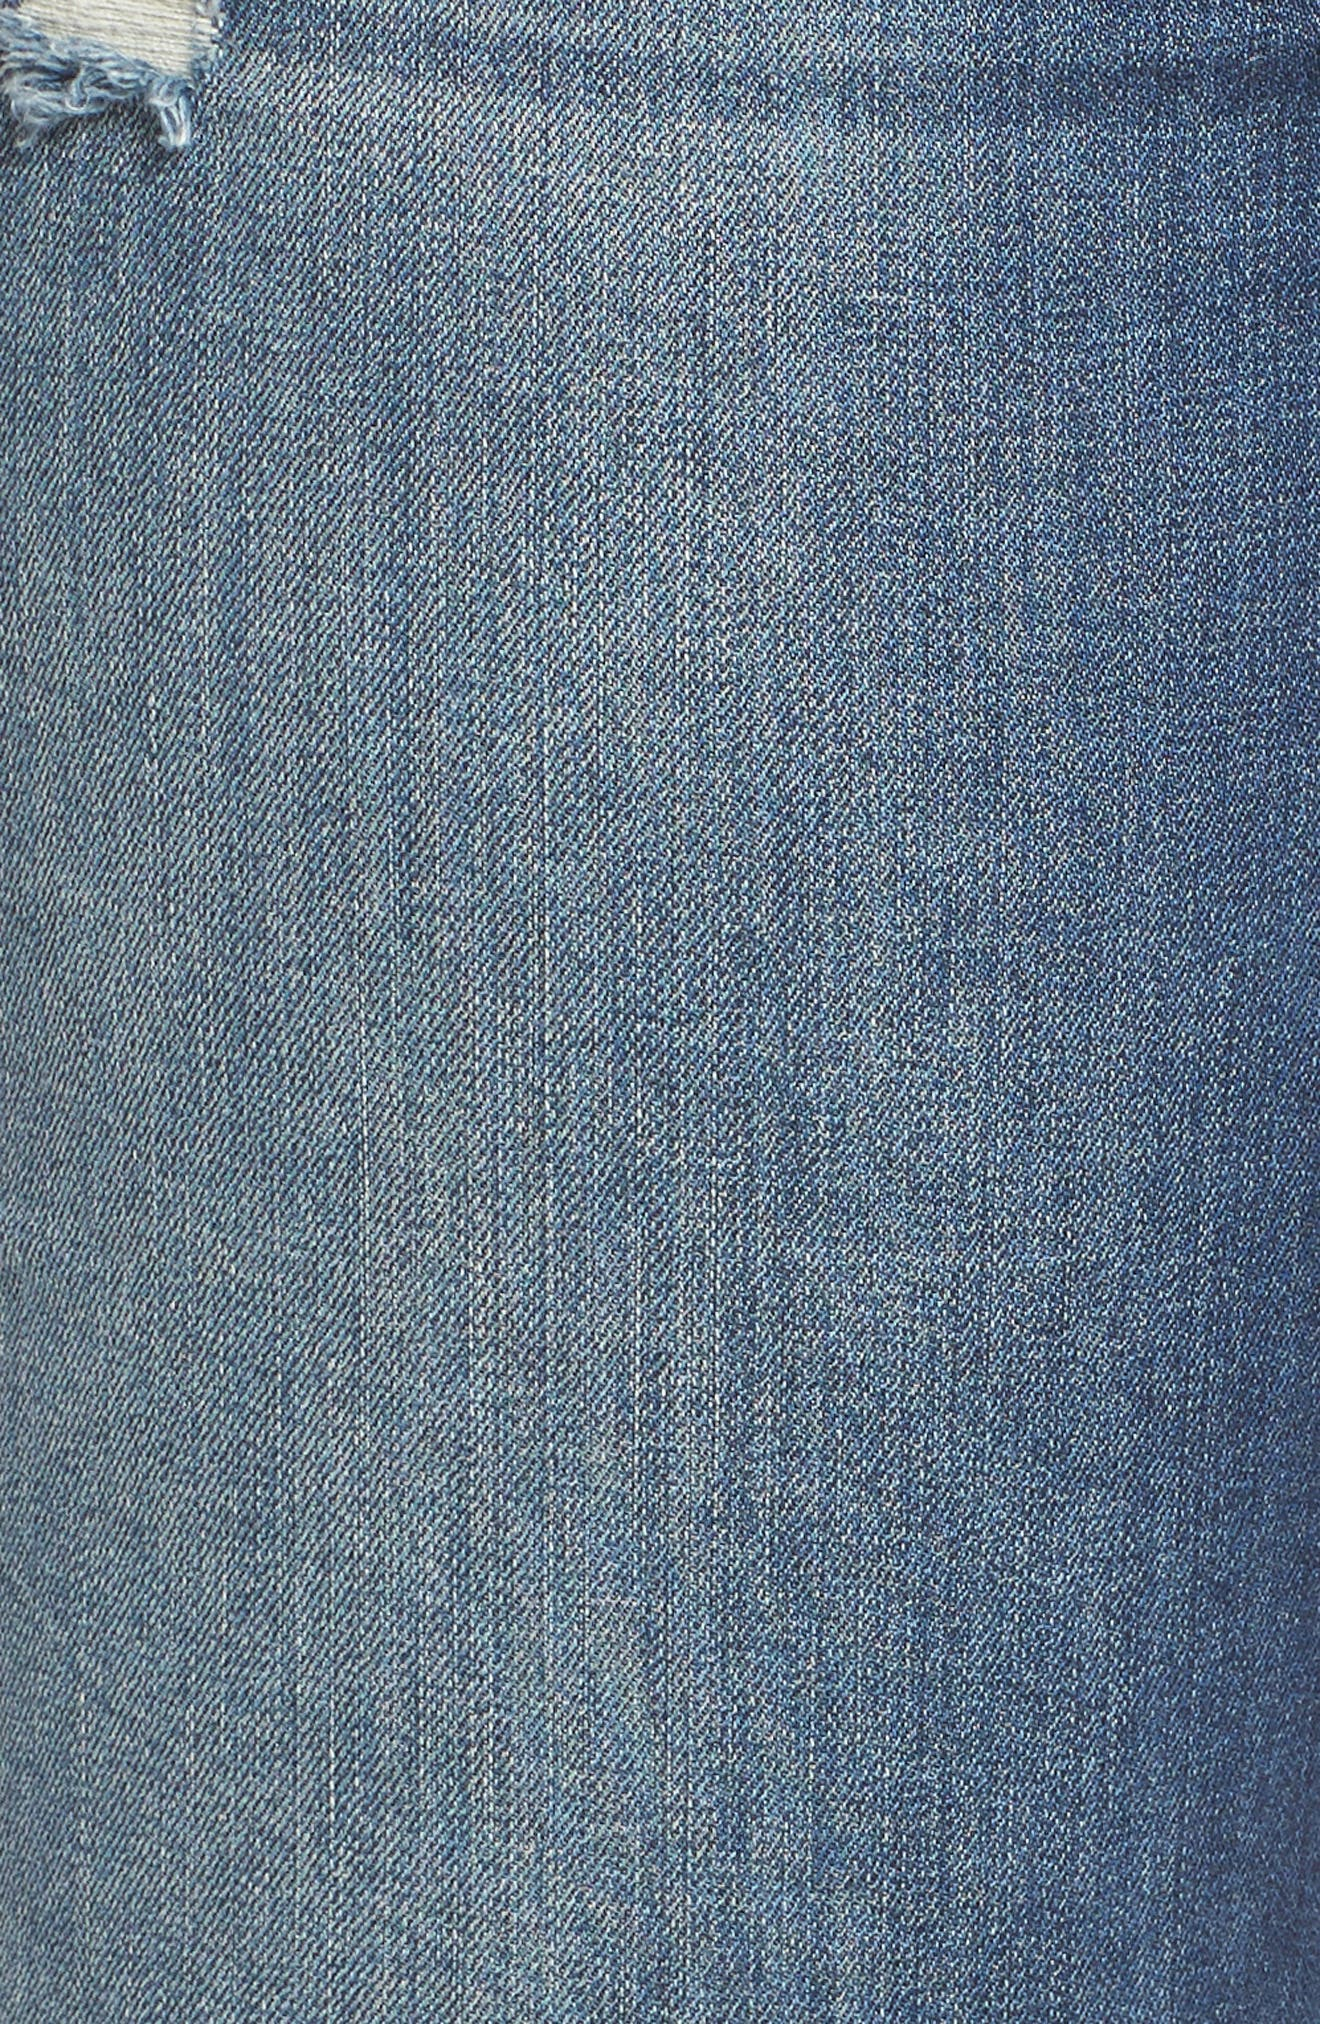 Ripped Roll Cuff Boyfriend Jeans,                             Alternate thumbnail 6, color,                             HUNTER